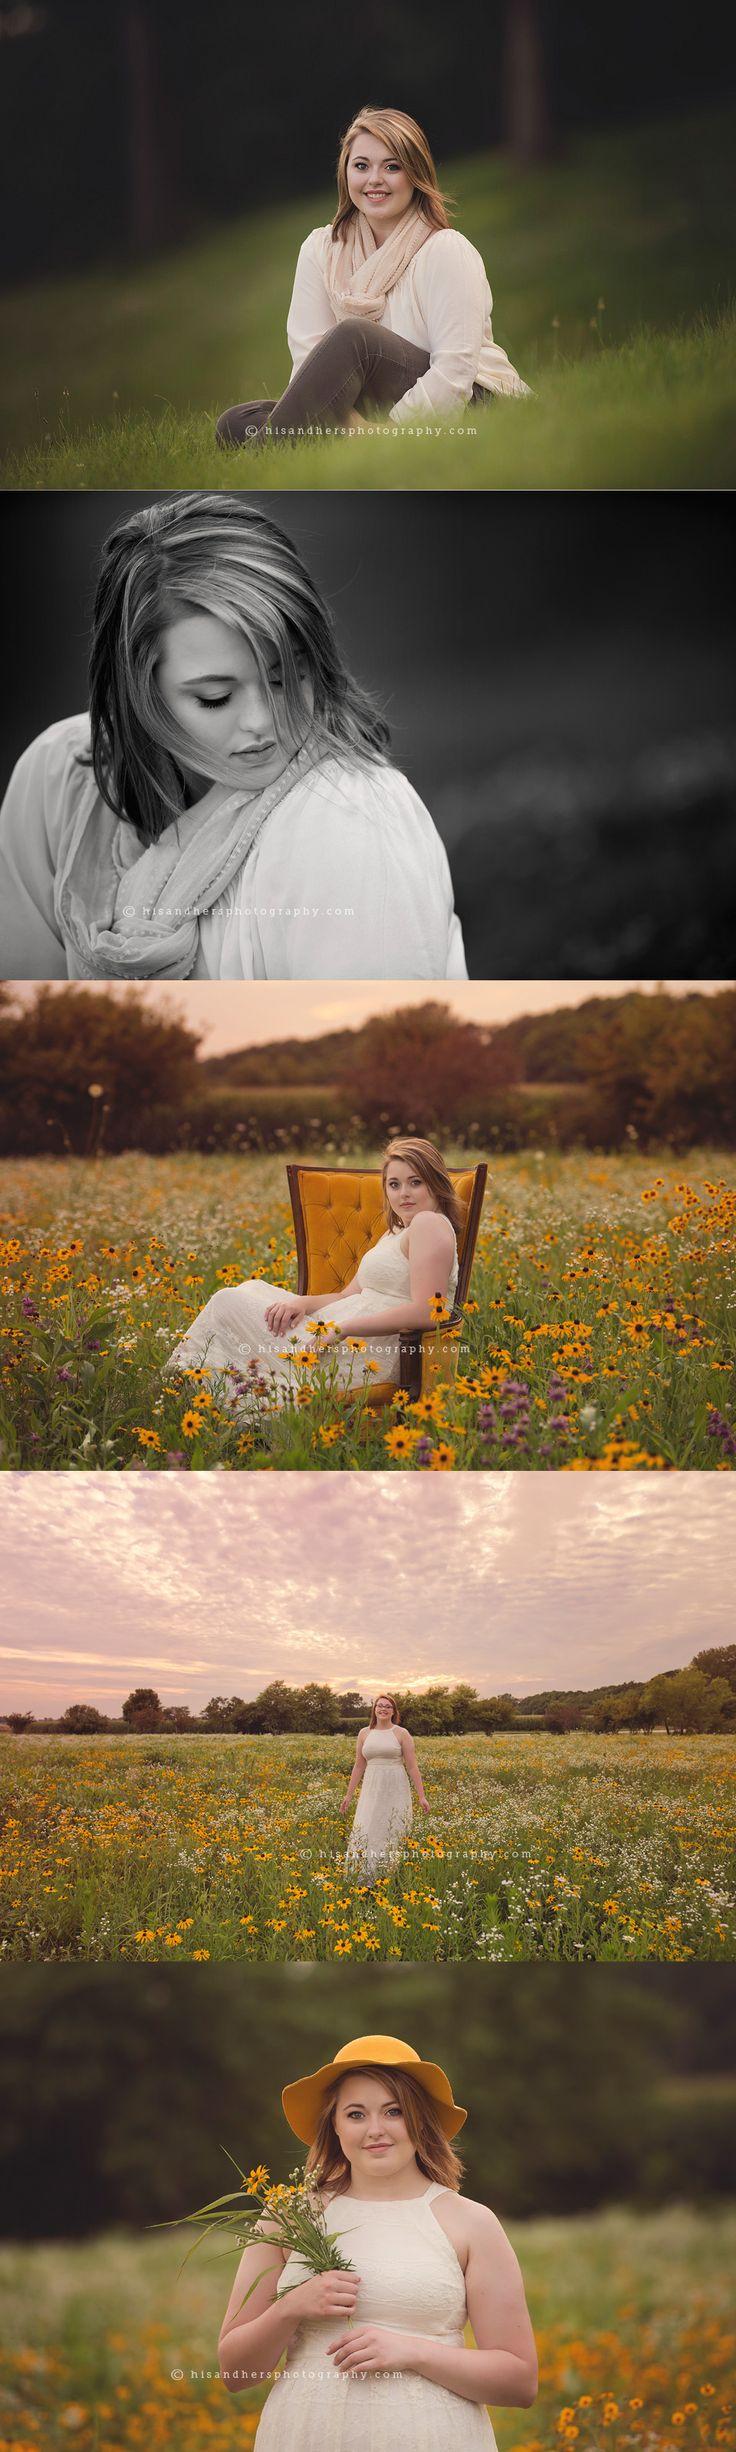 Des Moines, Iowa #seniorpics #seniorpix #seniorpictures #seniorportraits photographer, Randy Milder | His & Hers